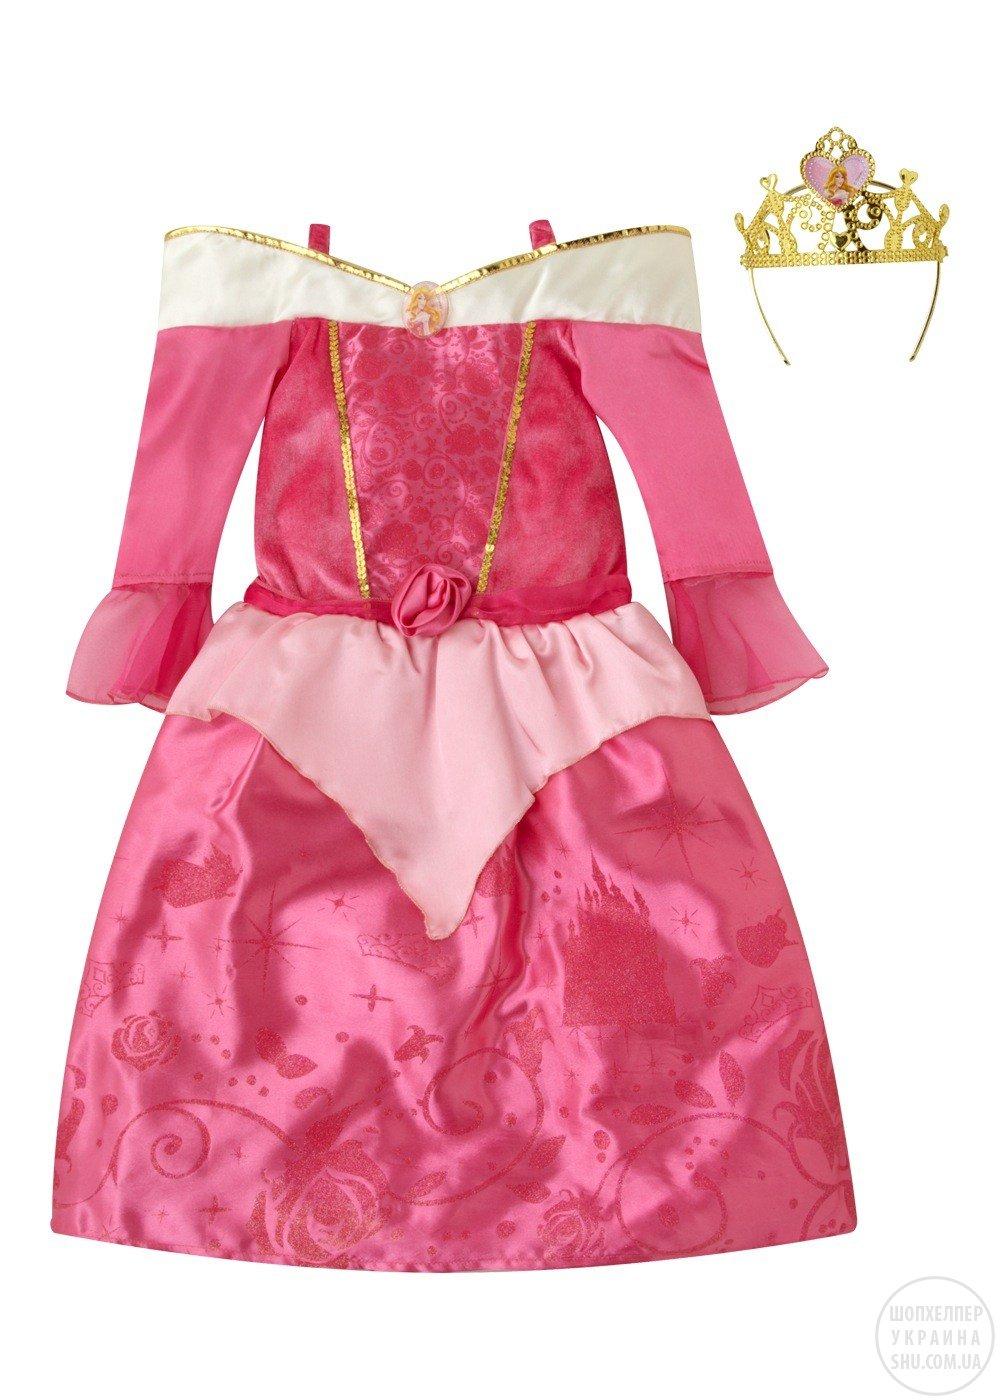 kids-disney-sleeping-beauty-dress-up-with-tiara.jpg